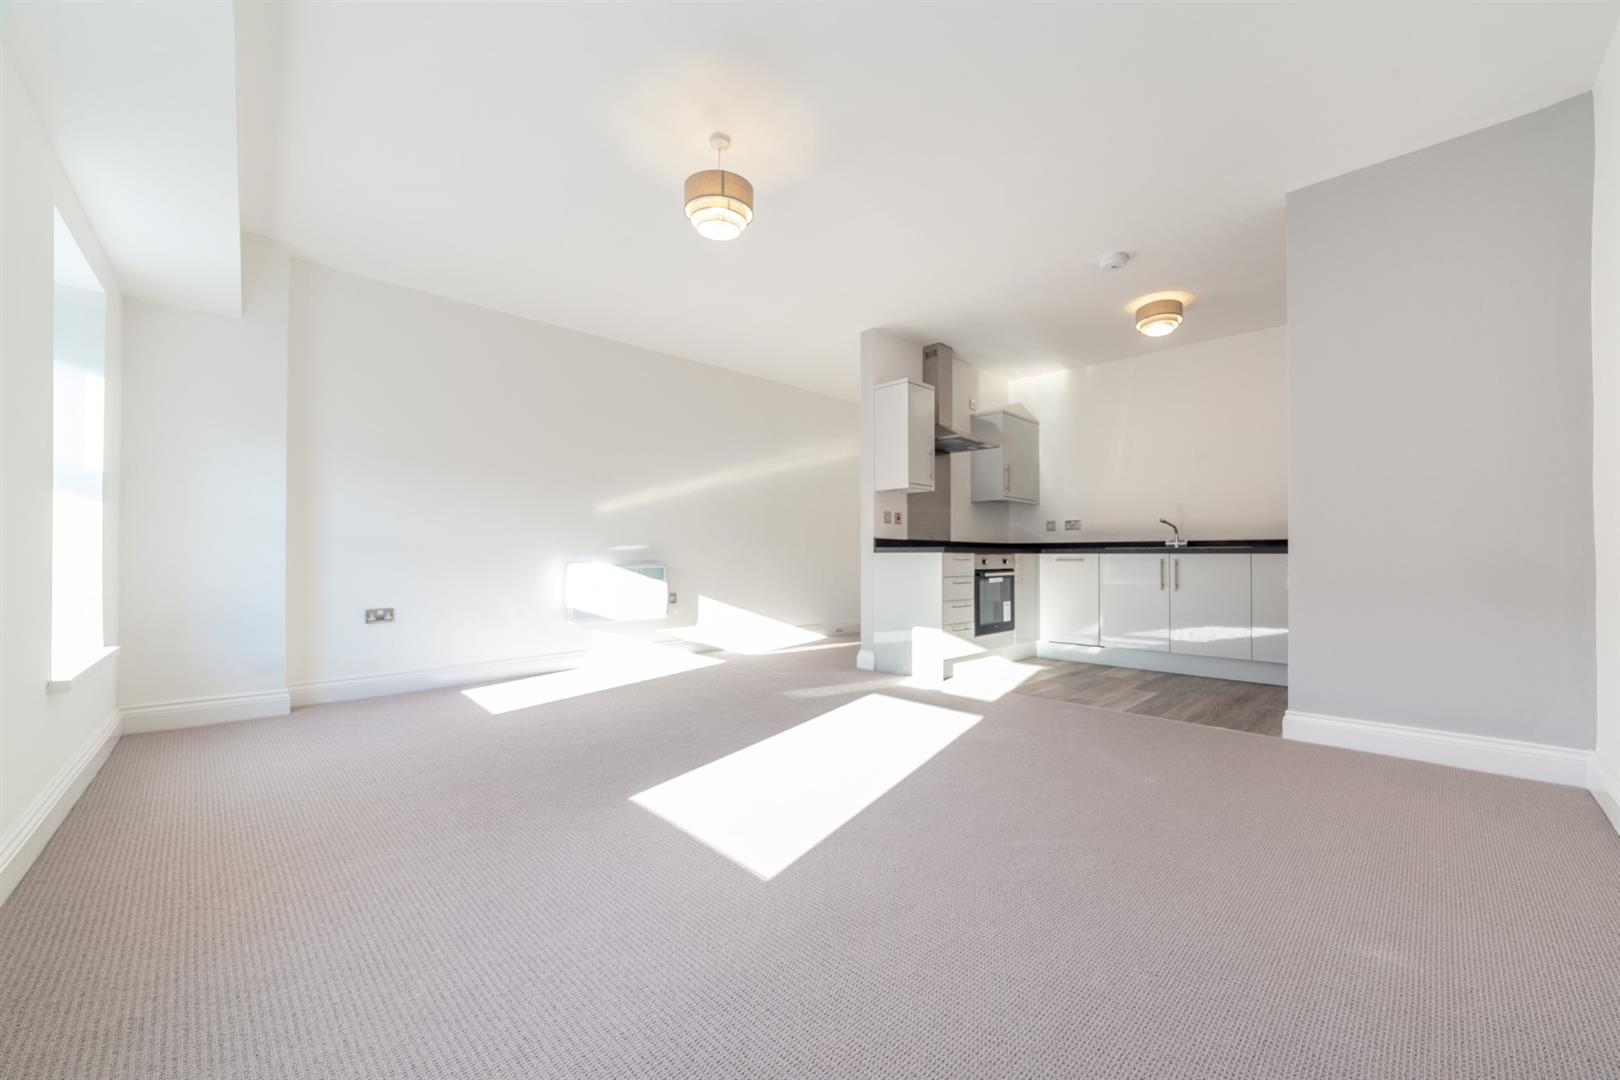 2 bed flat to rent in Morpeth, NE61 1NT, NE61